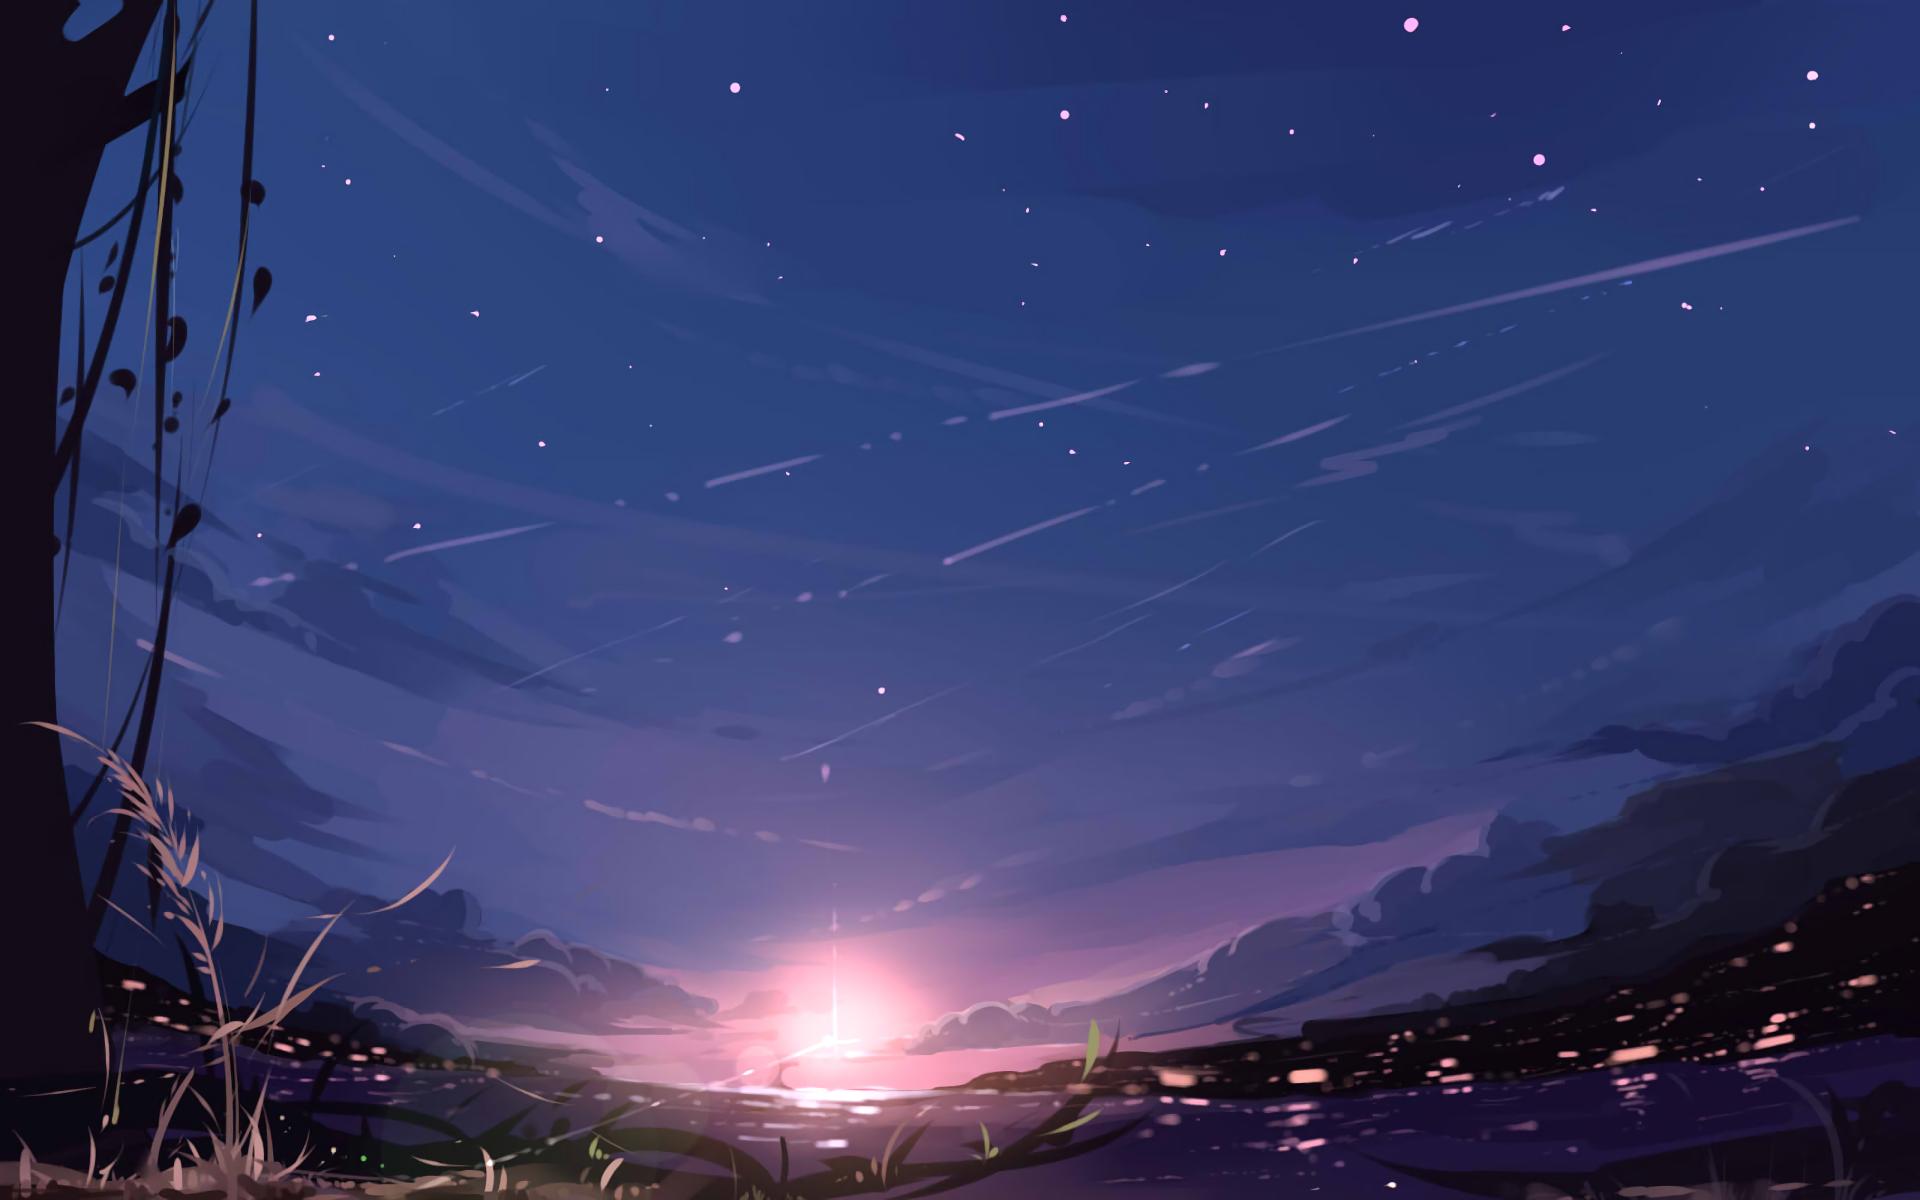 Anime Original Night Light Wallpaper Anime backgrounds